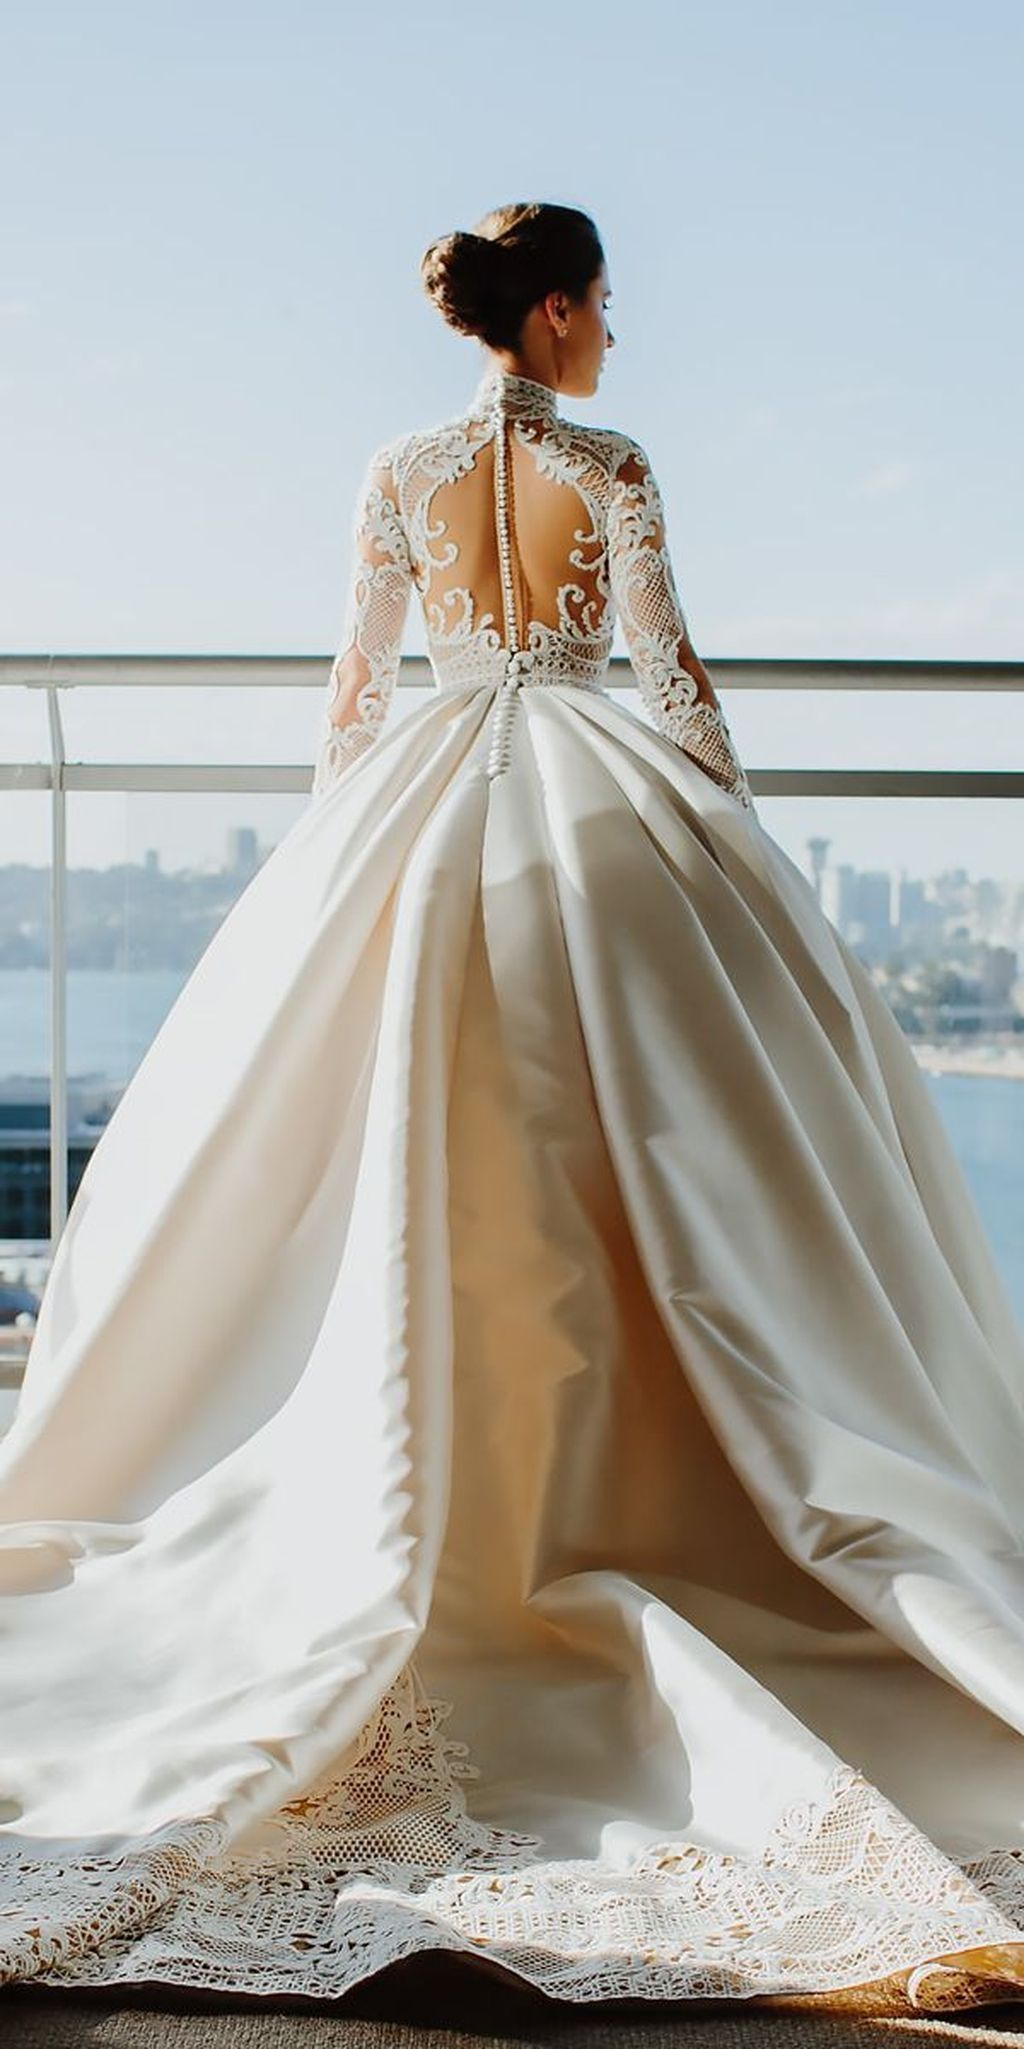 Awesome amazing long sleeve wedding dresses ideas more at